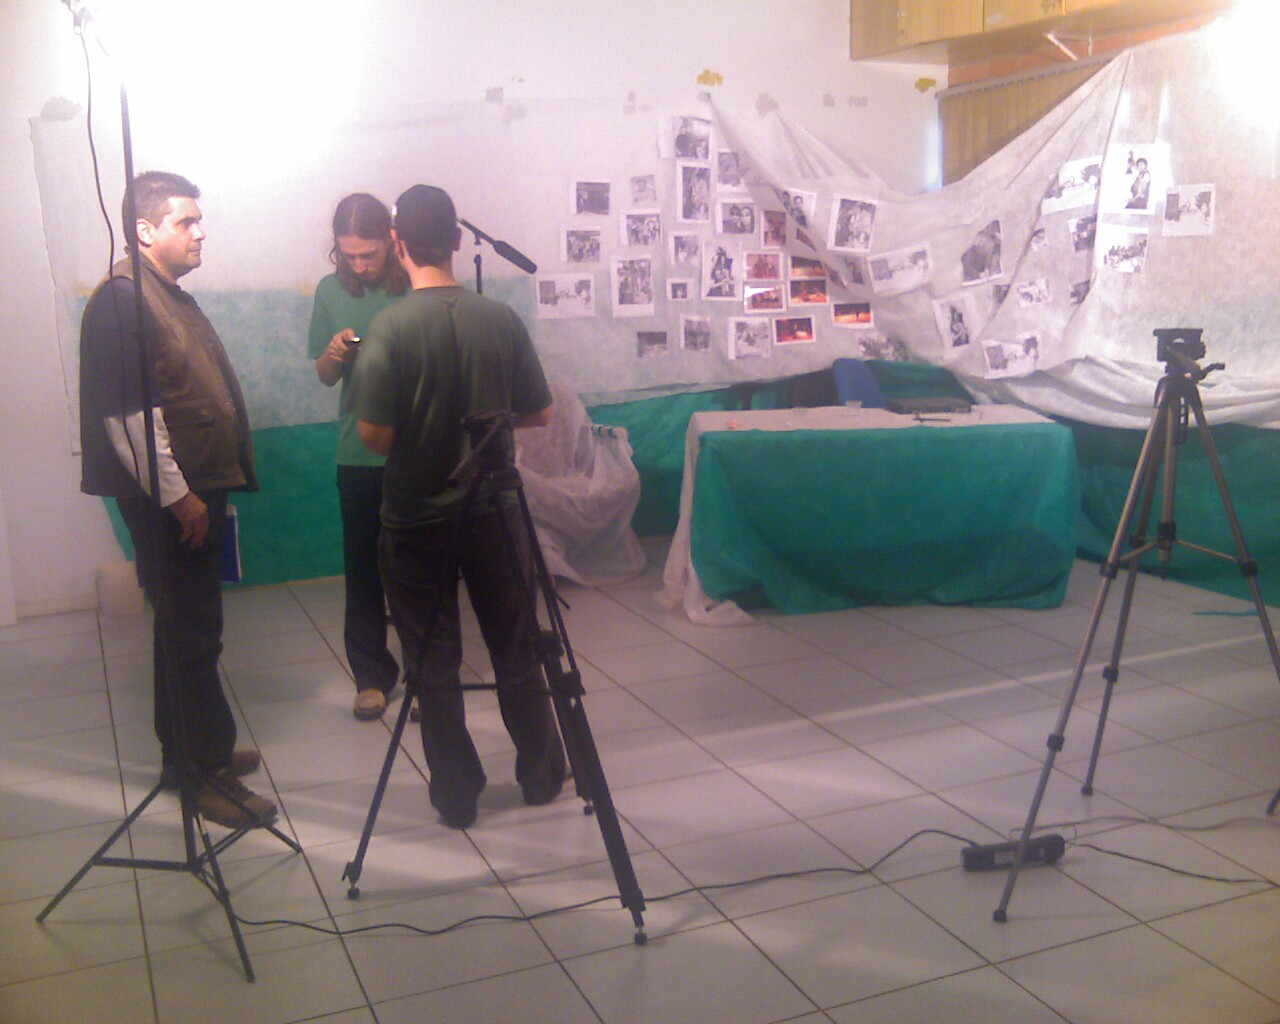 #pontodecultura #chapeco @PontosSC b#culturaviva